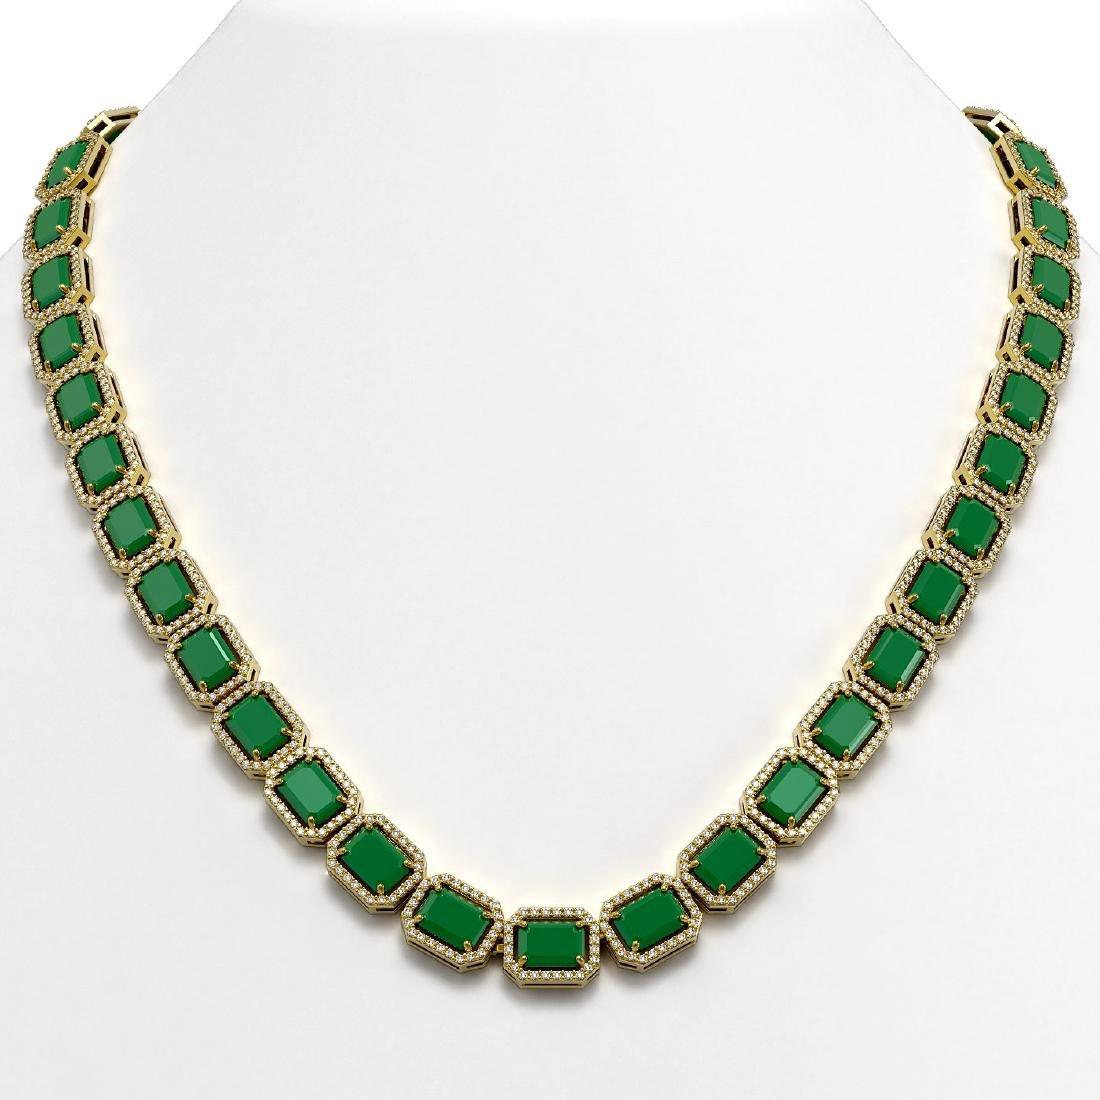 58.59 CTW Emerald & Diamond Halo Necklace 10K Yellow